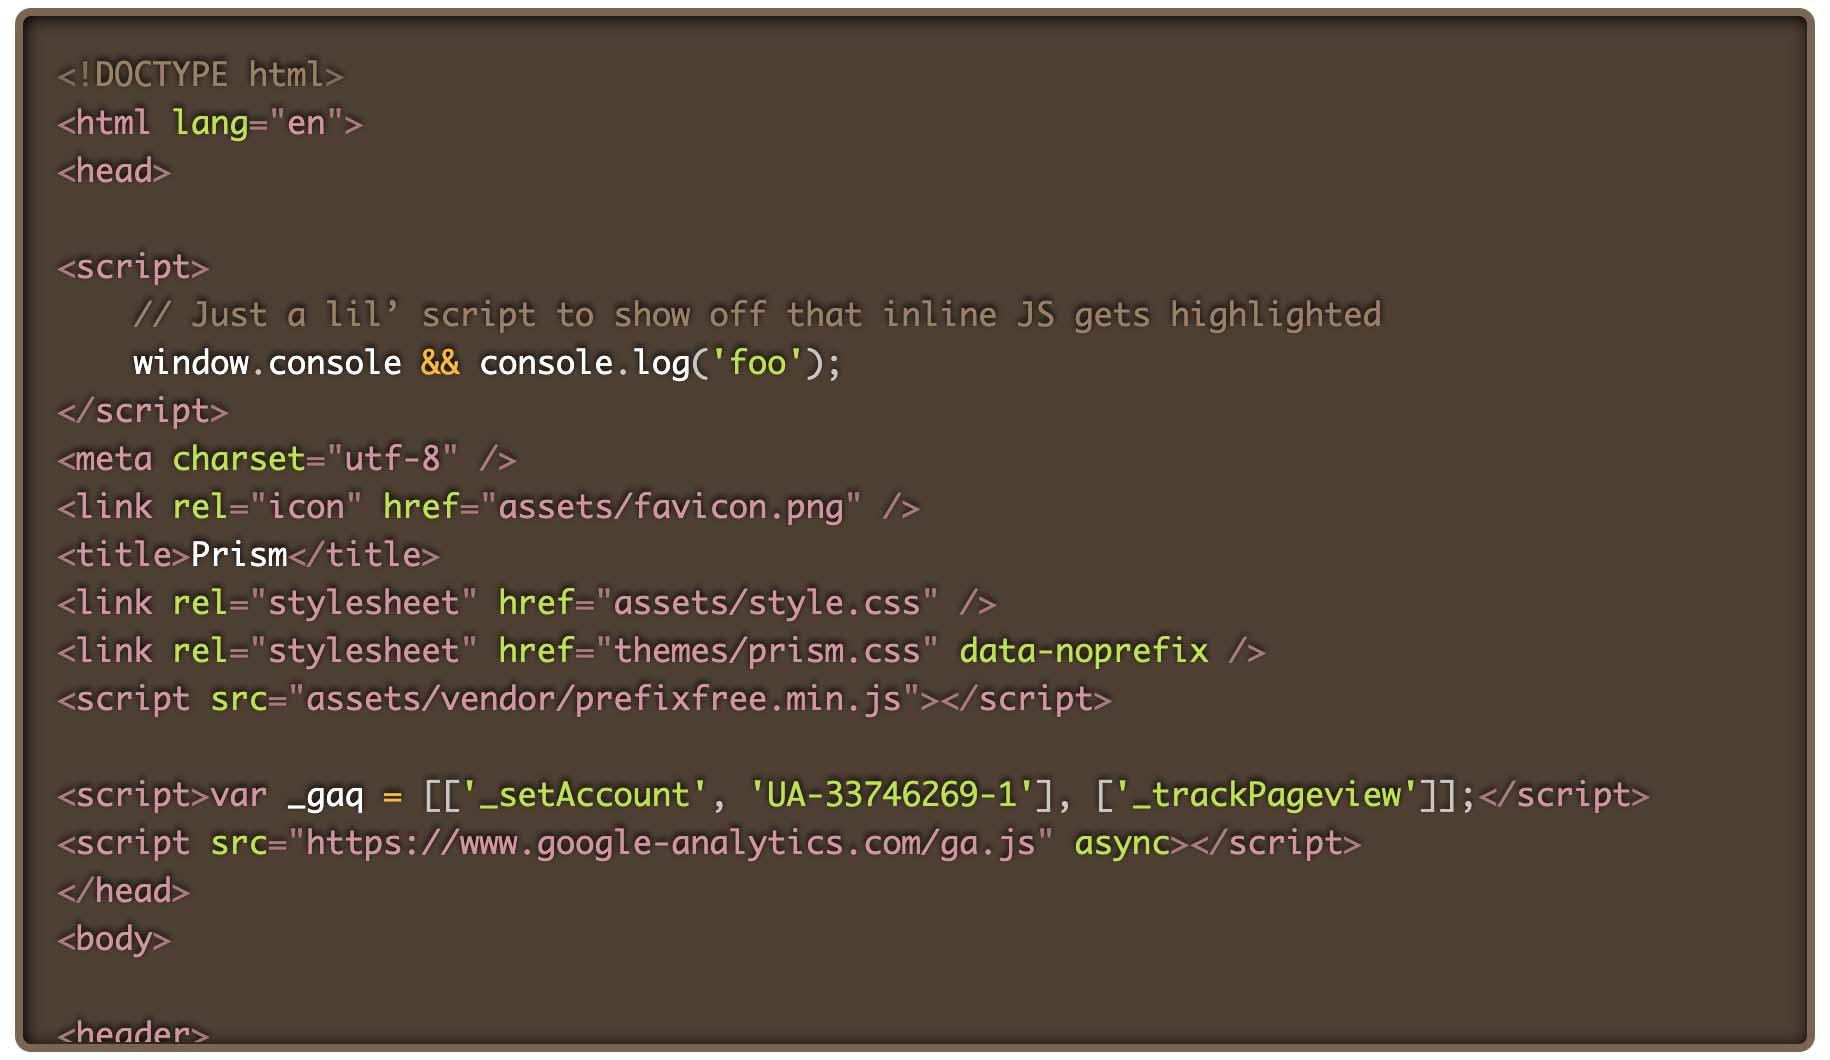 Prism.jsでDarkのテーマを選択した際のコード表示